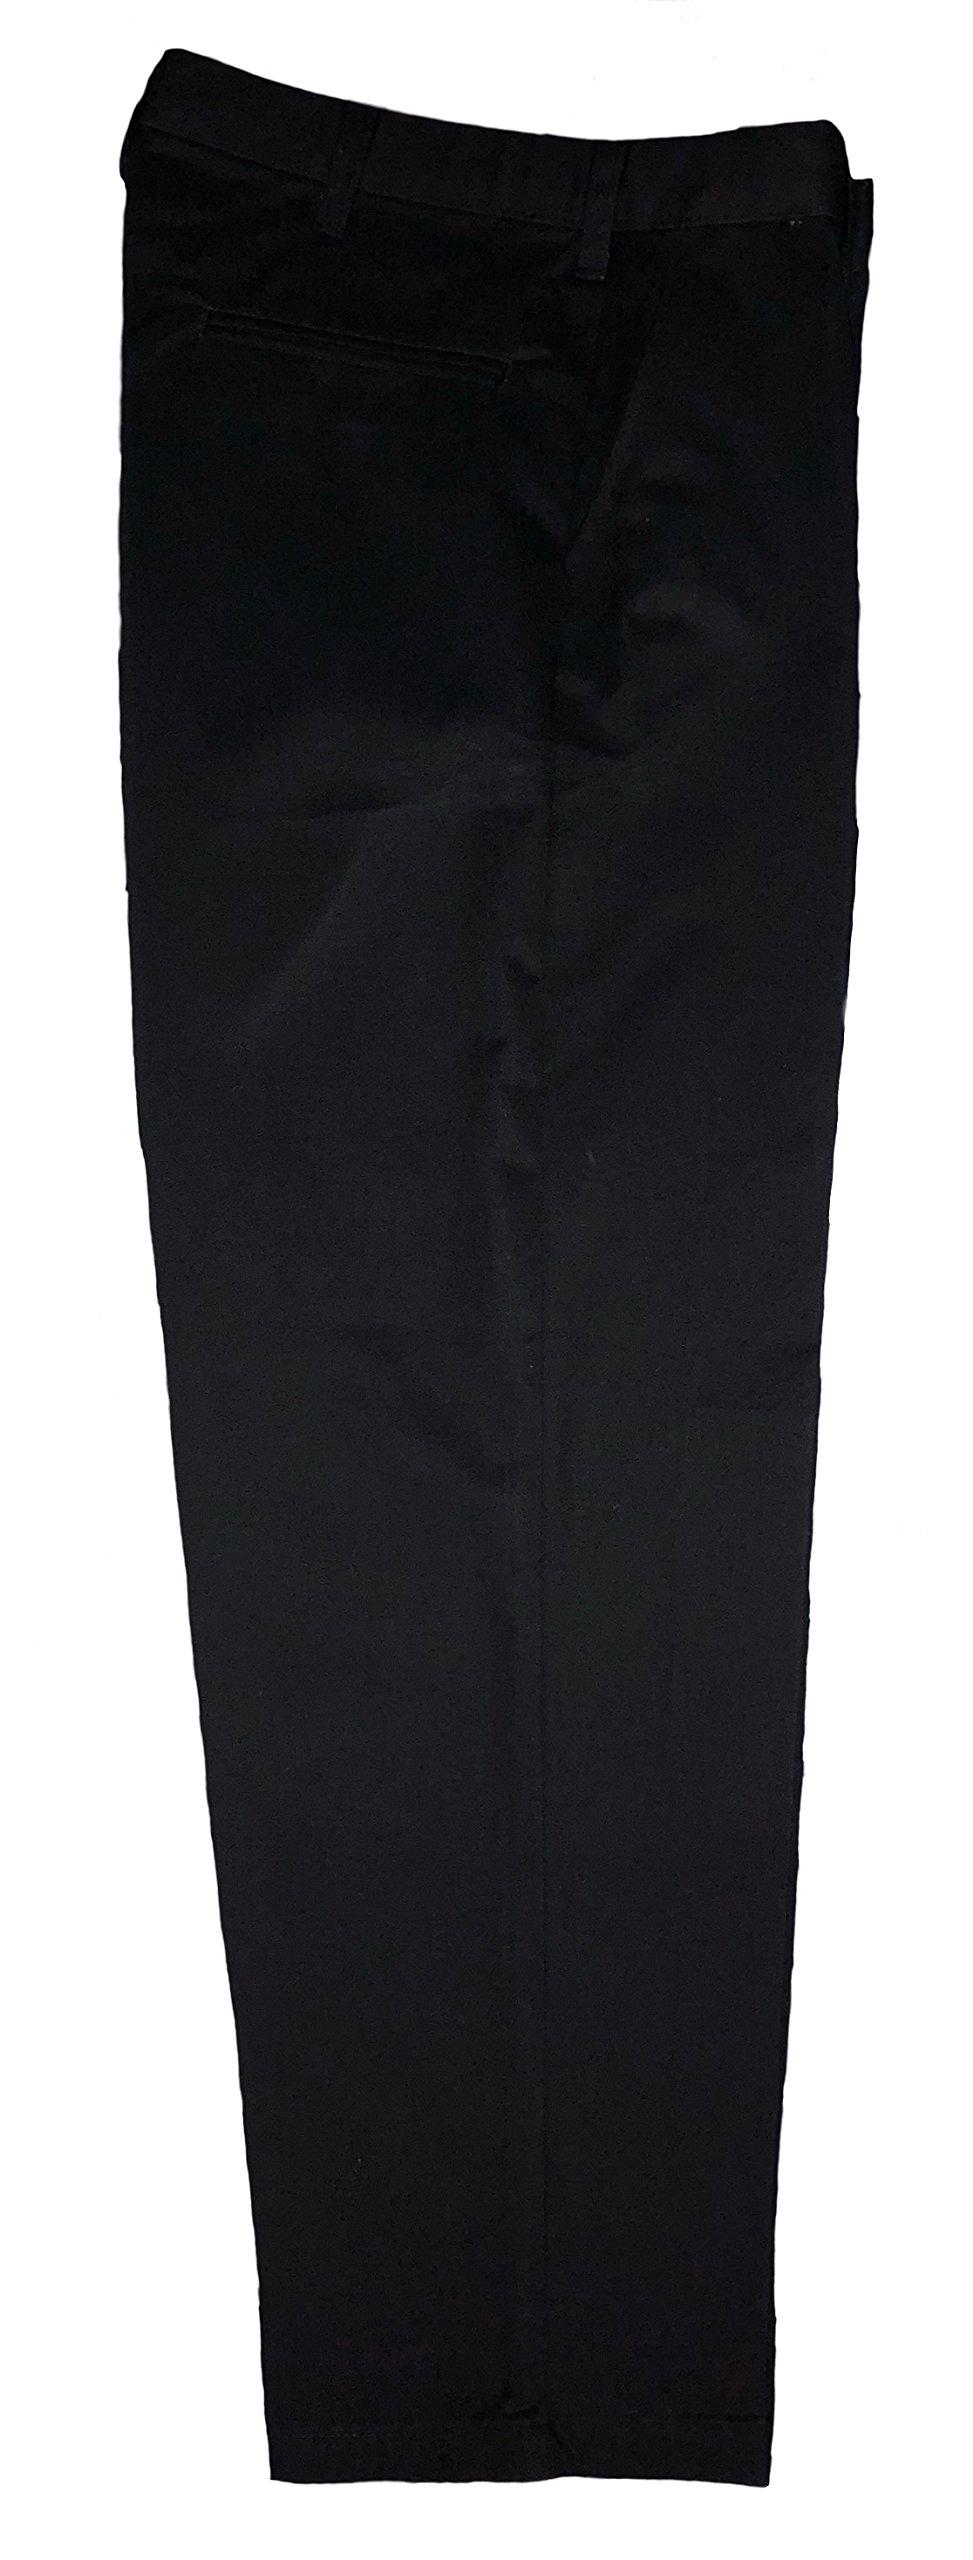 Rifle School Uniform Husky Plain Front Relax Twill Pant - Size 25